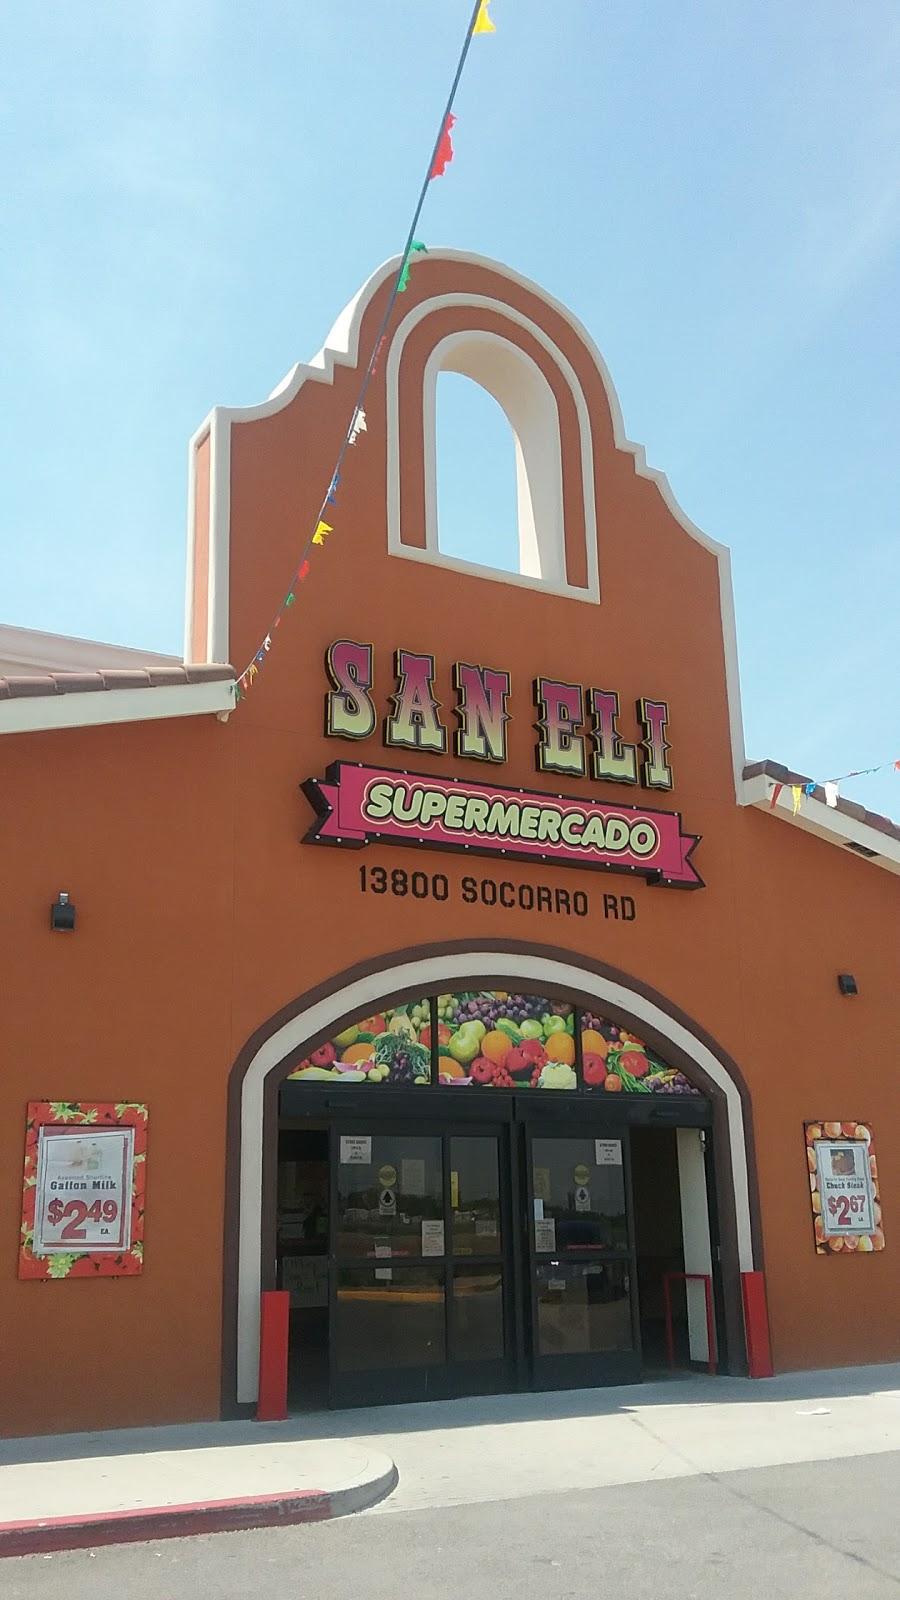 San Eli Supermercado Llc - supermarket    Photo 1 of 10   Address: 13800 Socorro Rd, San Elizario, TX 79849, USA   Phone: (915) 851-1412